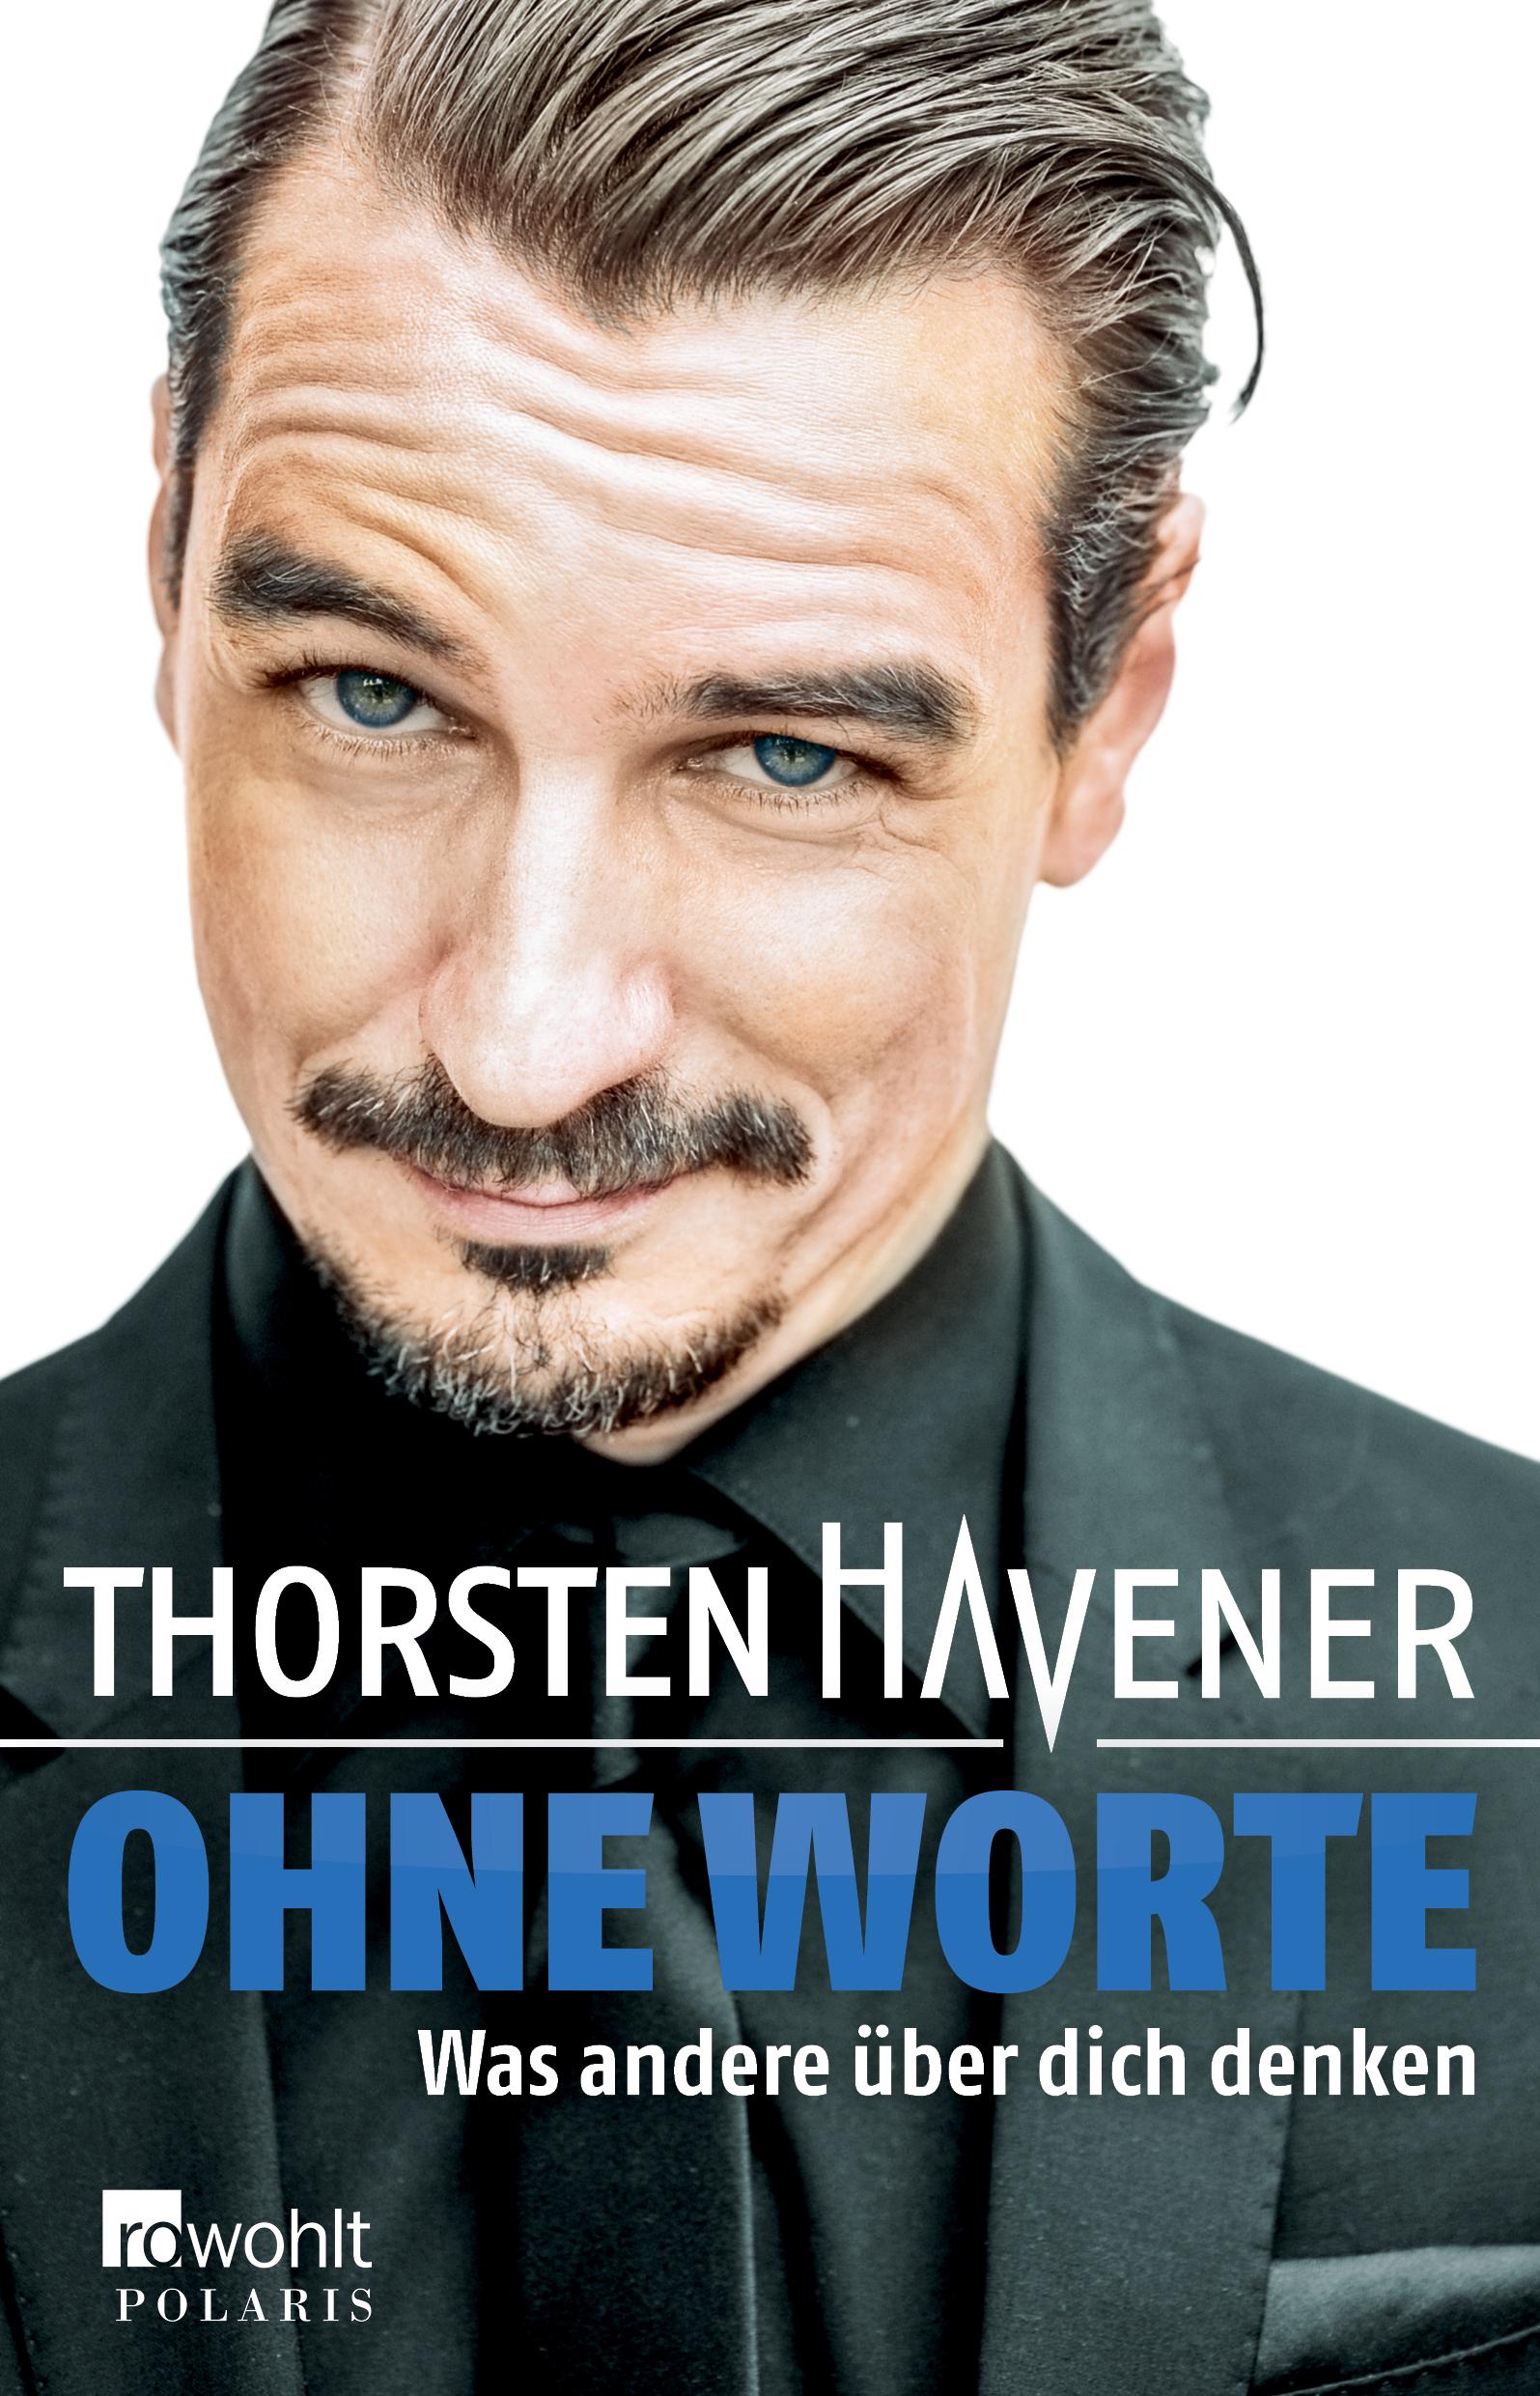 Expert Marketplace -  Thorsten Havener  -  Thorsten Havener: Ohne Worte Was andere über dich denken